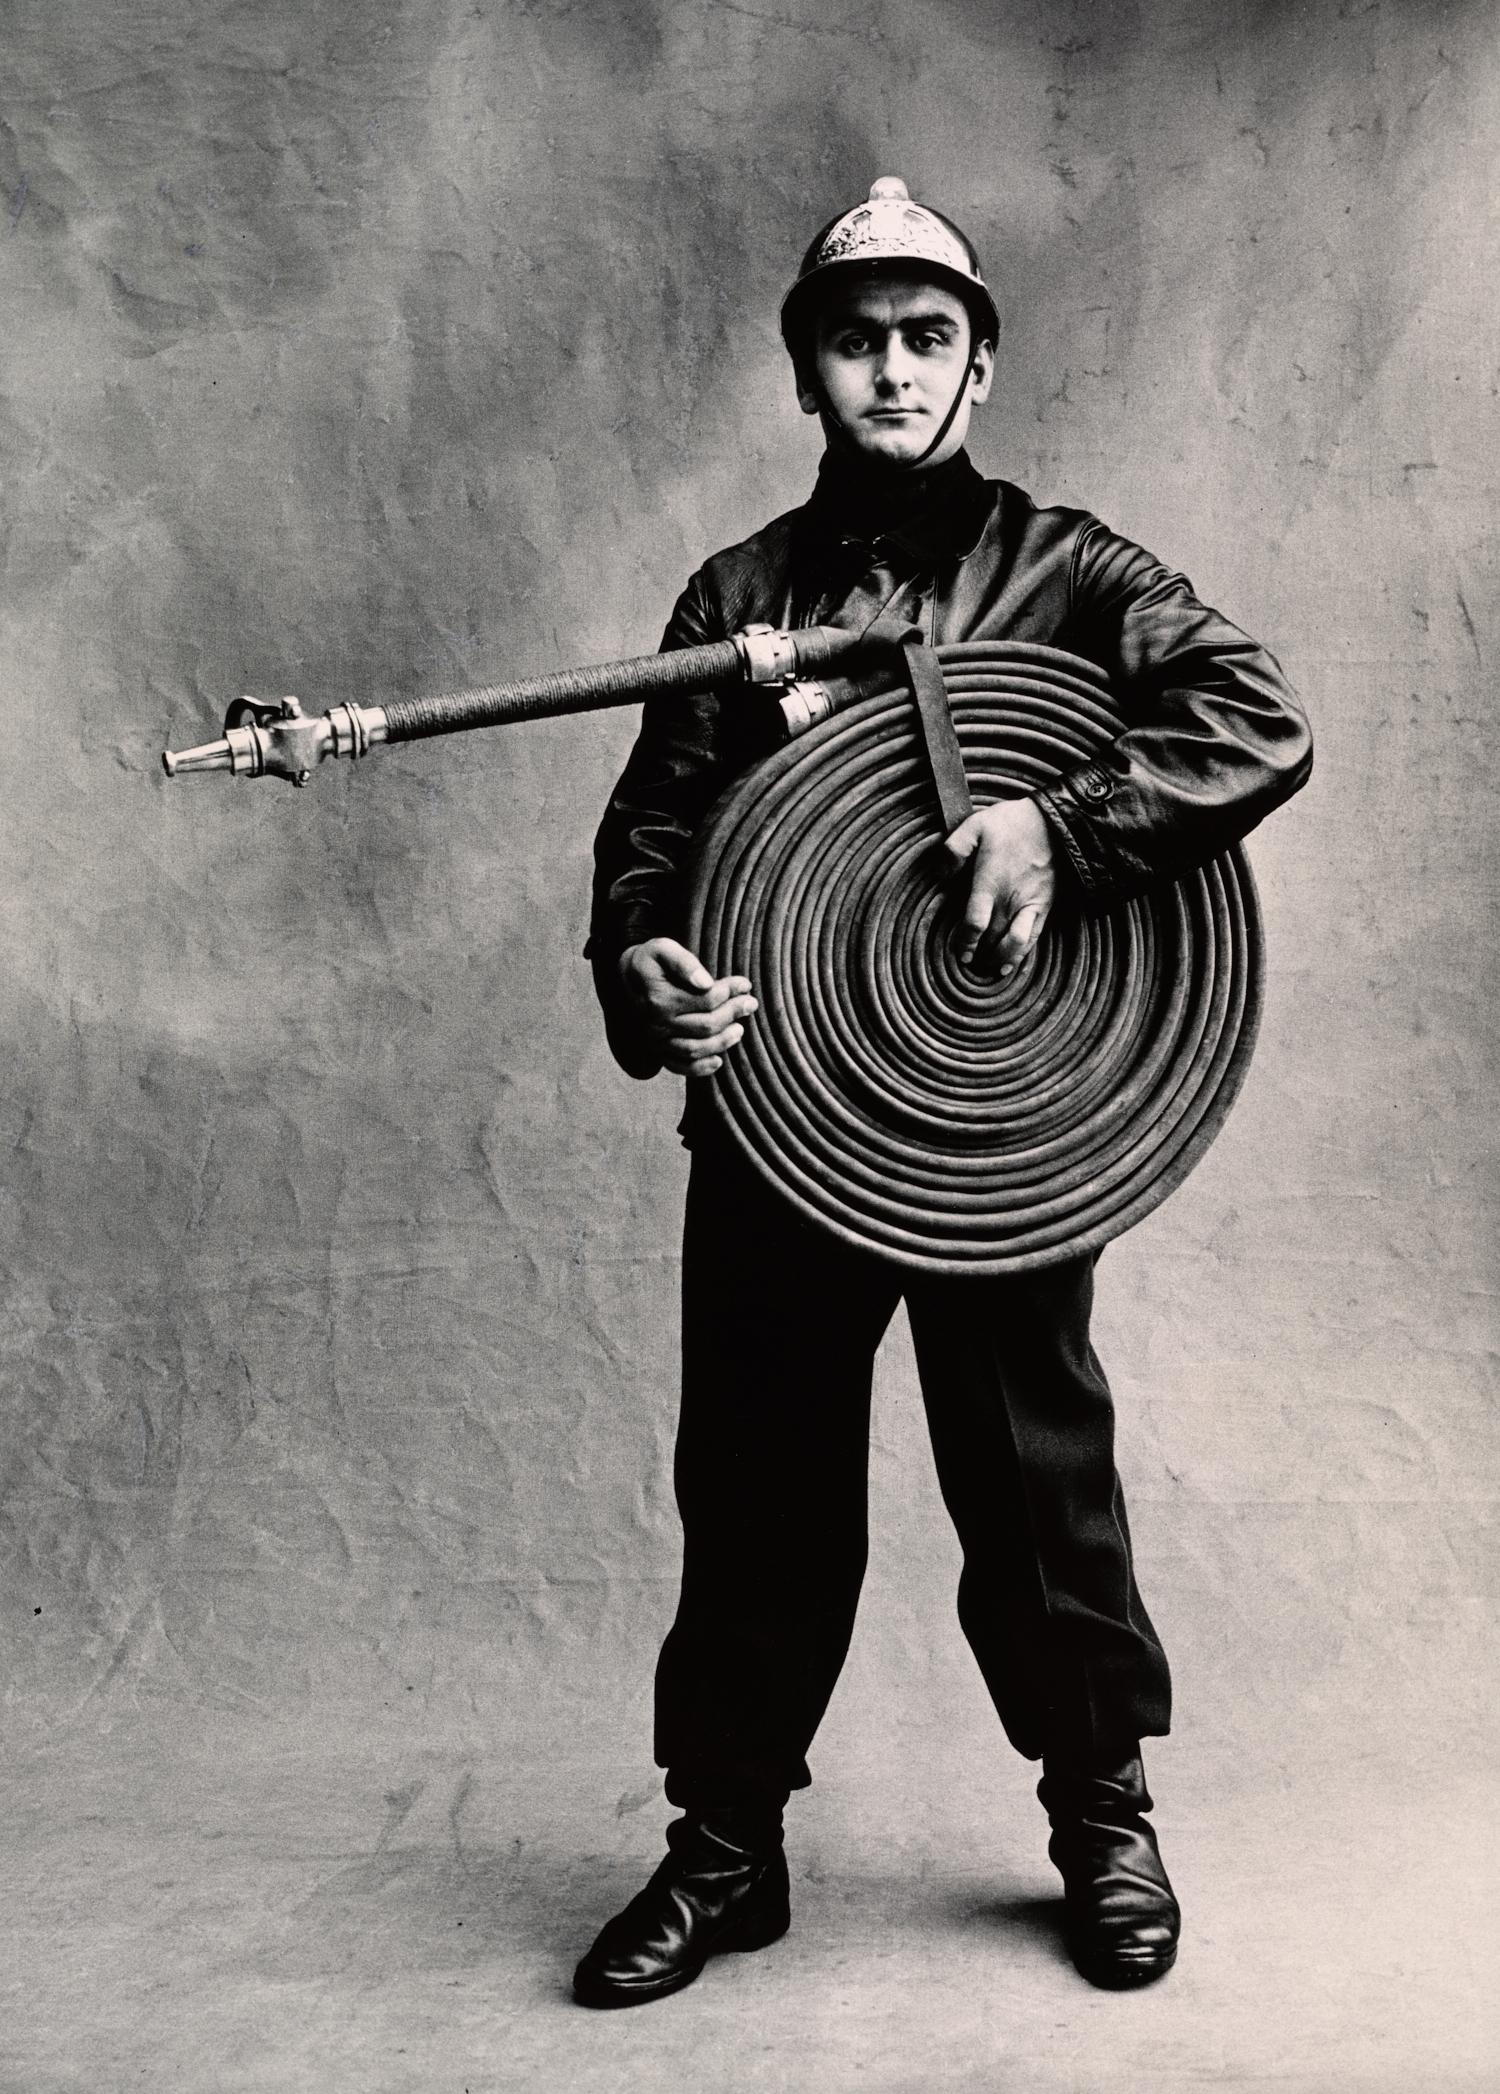 Pompier , Paris, 1950 [Fireman] Gelatin silver print © Condé Nast (Fr.)